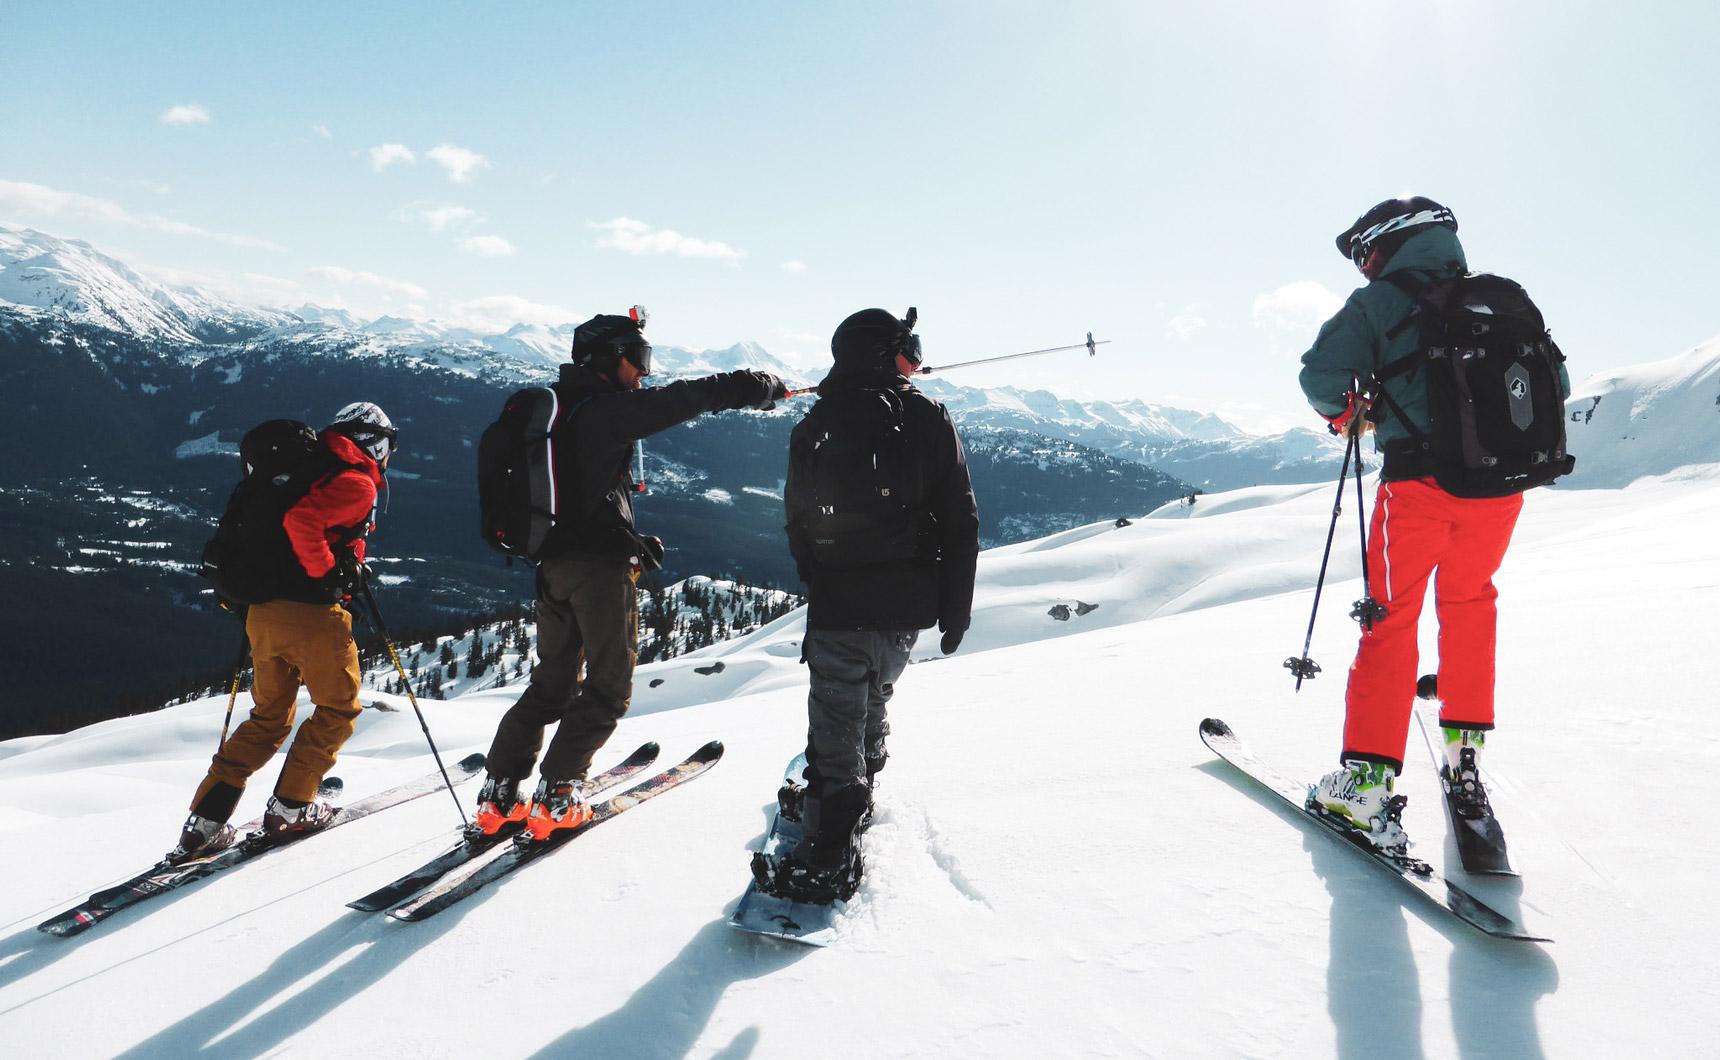 Laveno: Skii